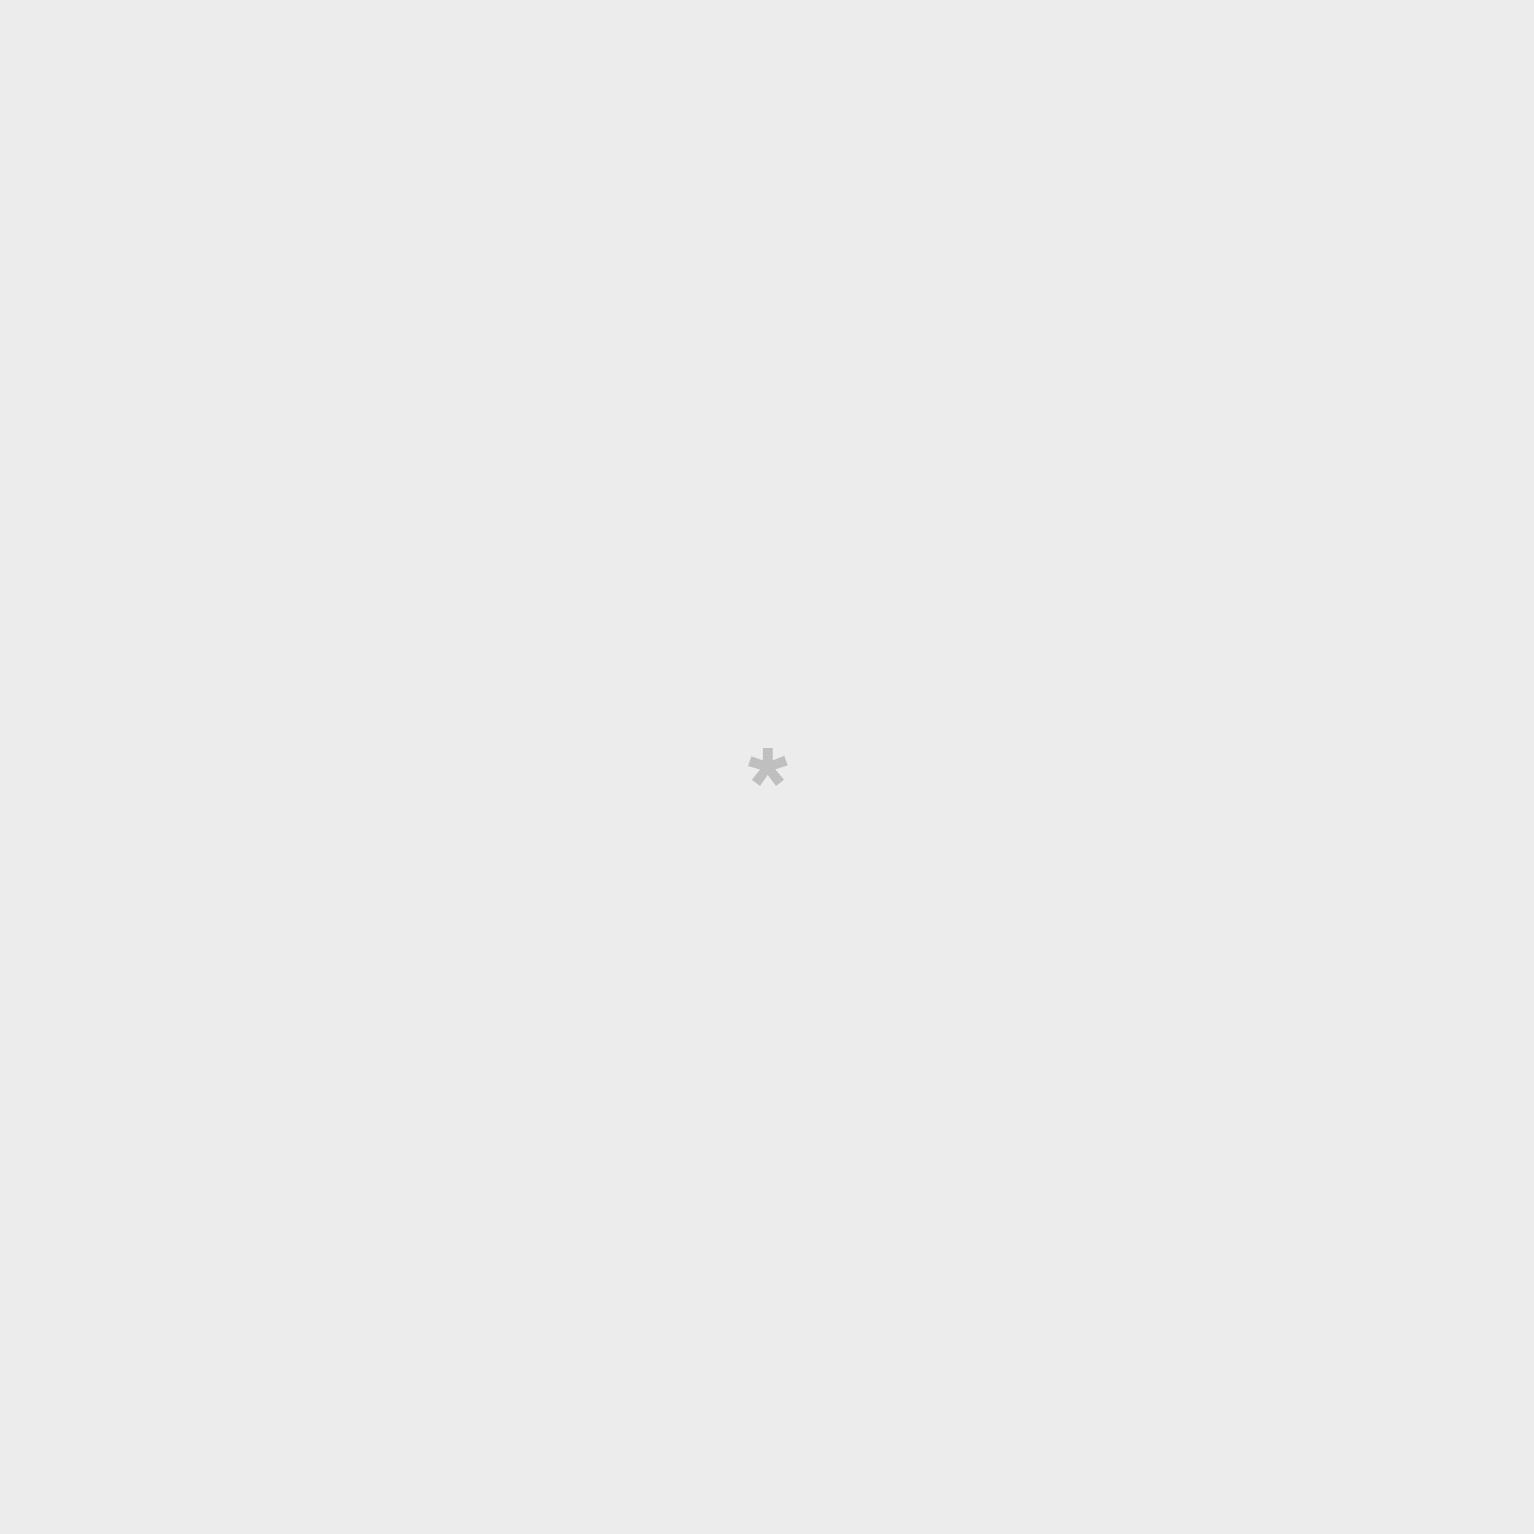 Pen with squishy - Avocado